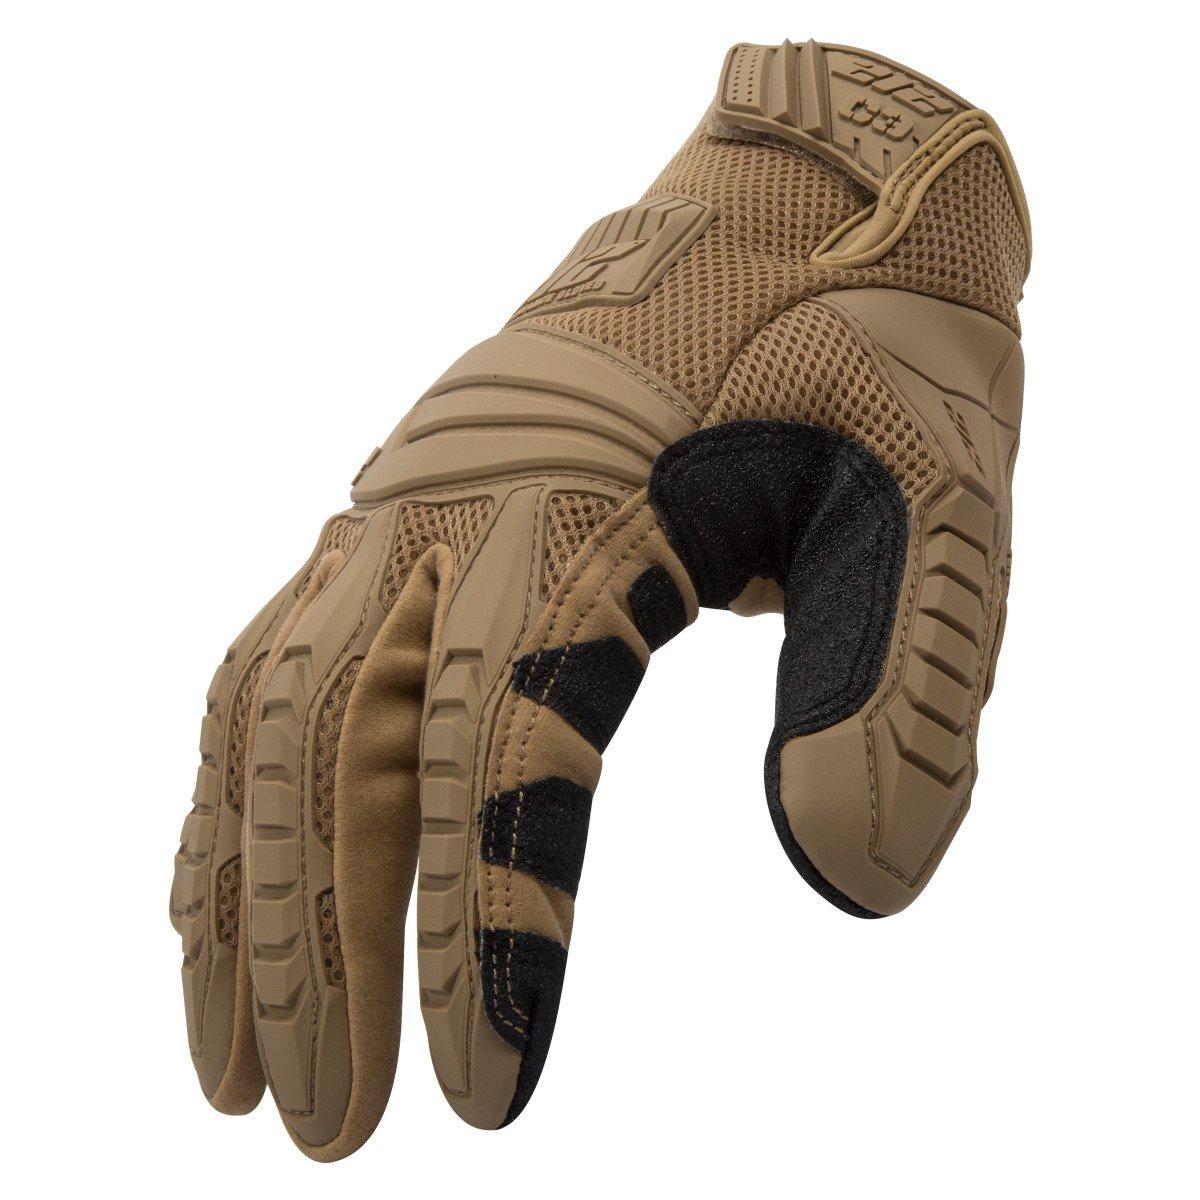 212 Performance Gloves IMPC3AM-70-010 Cut Resistant Impact Air Mesh Gloves (EN Level 3), Large